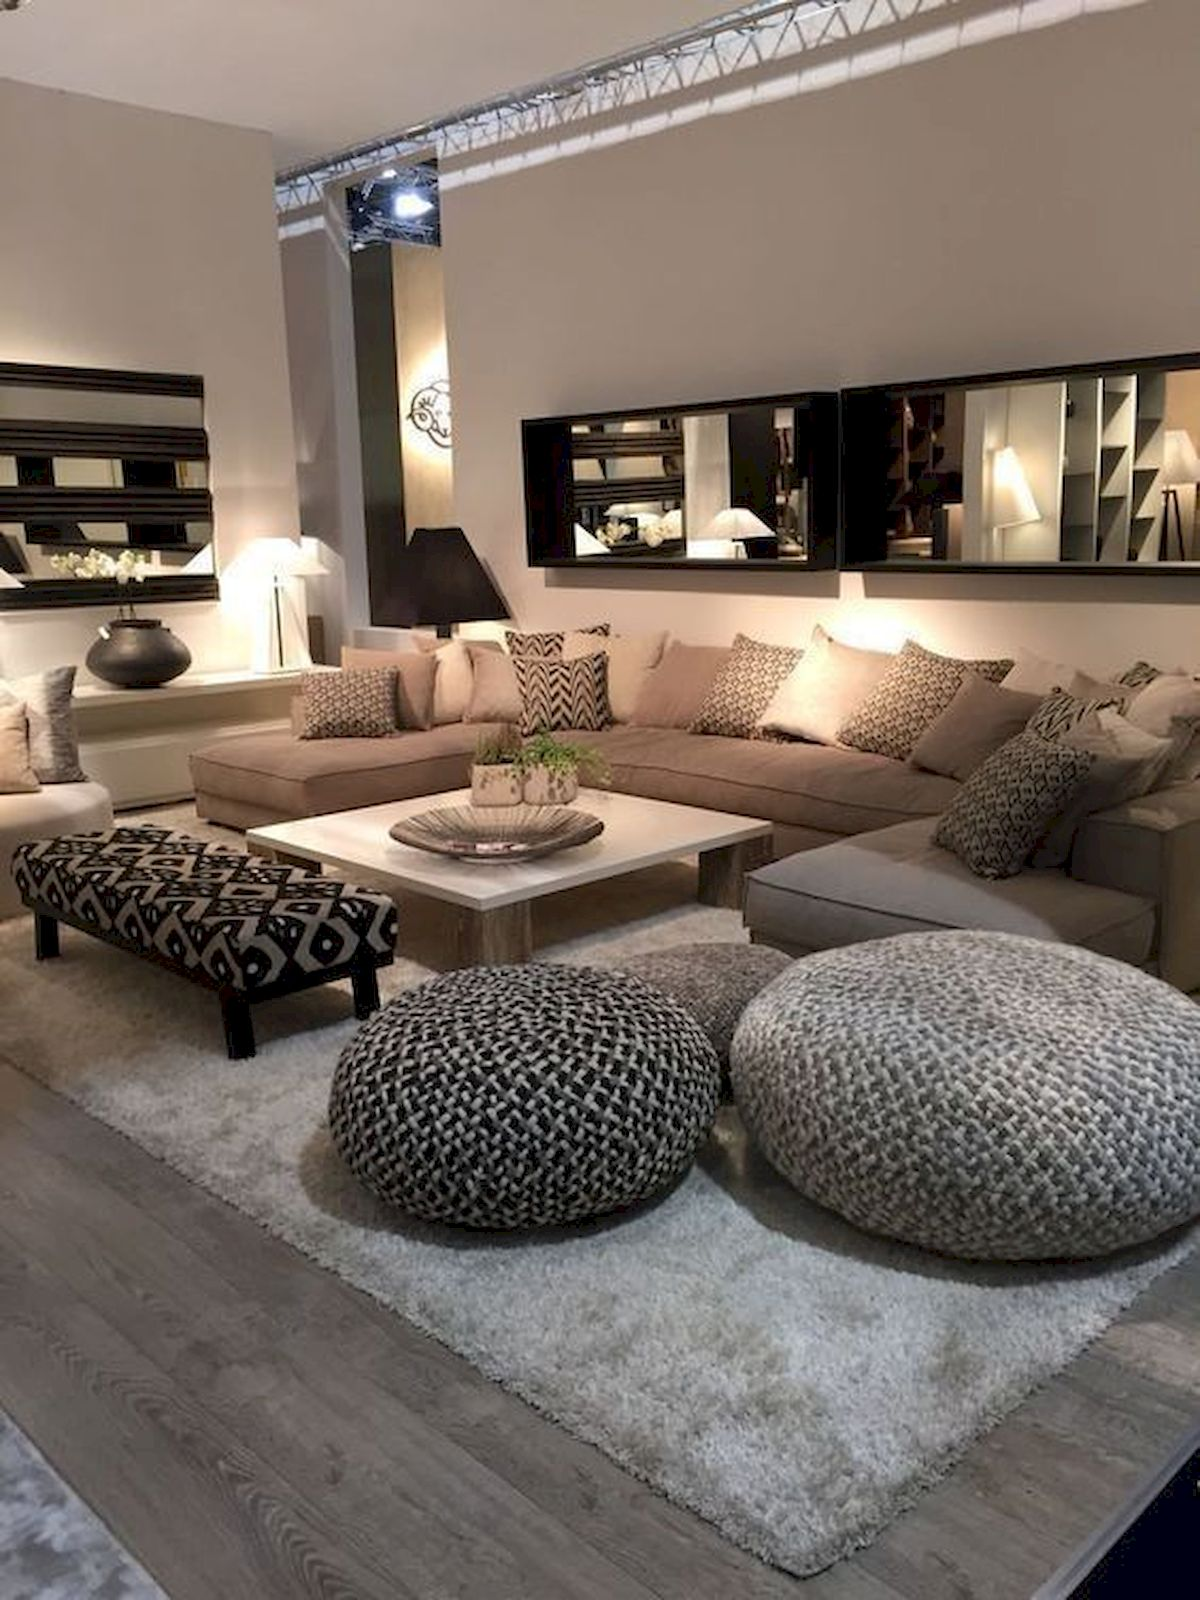 50 Gorgeous Living Room Decor and Design Ideas (6)